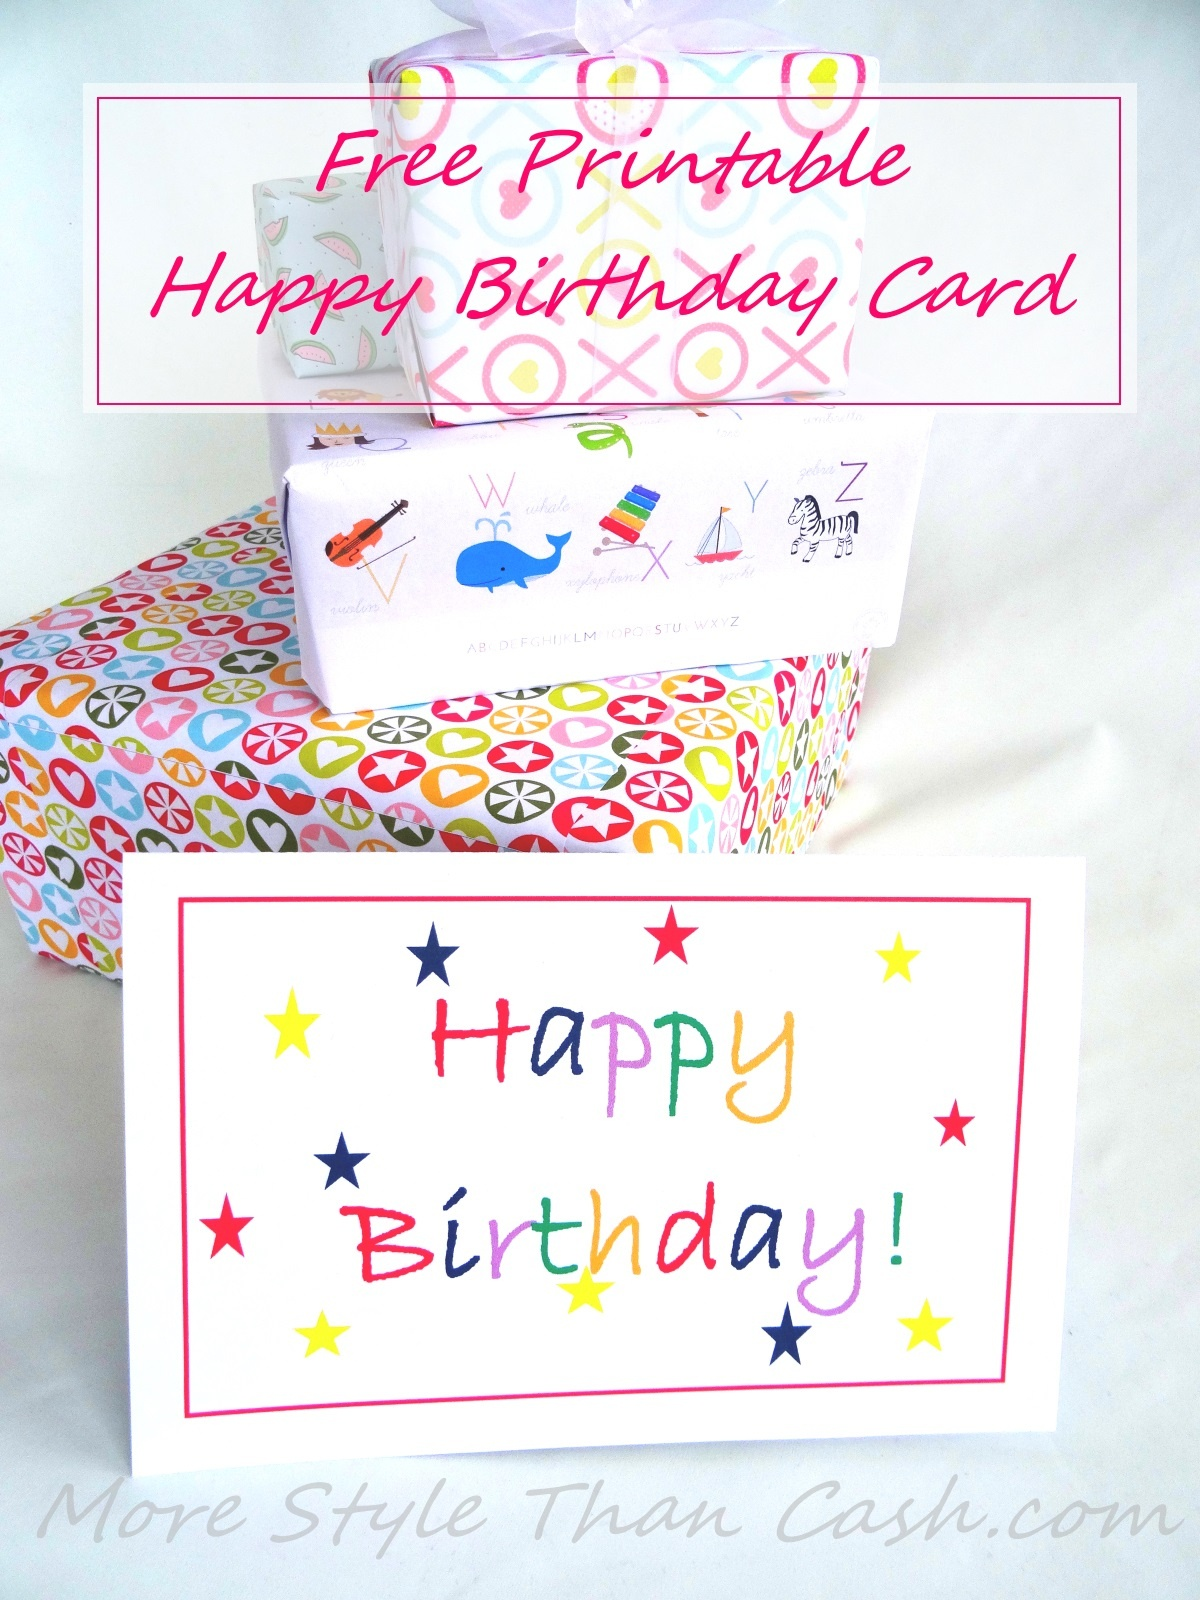 Free Printable Birthday Card - Free Printable Cards